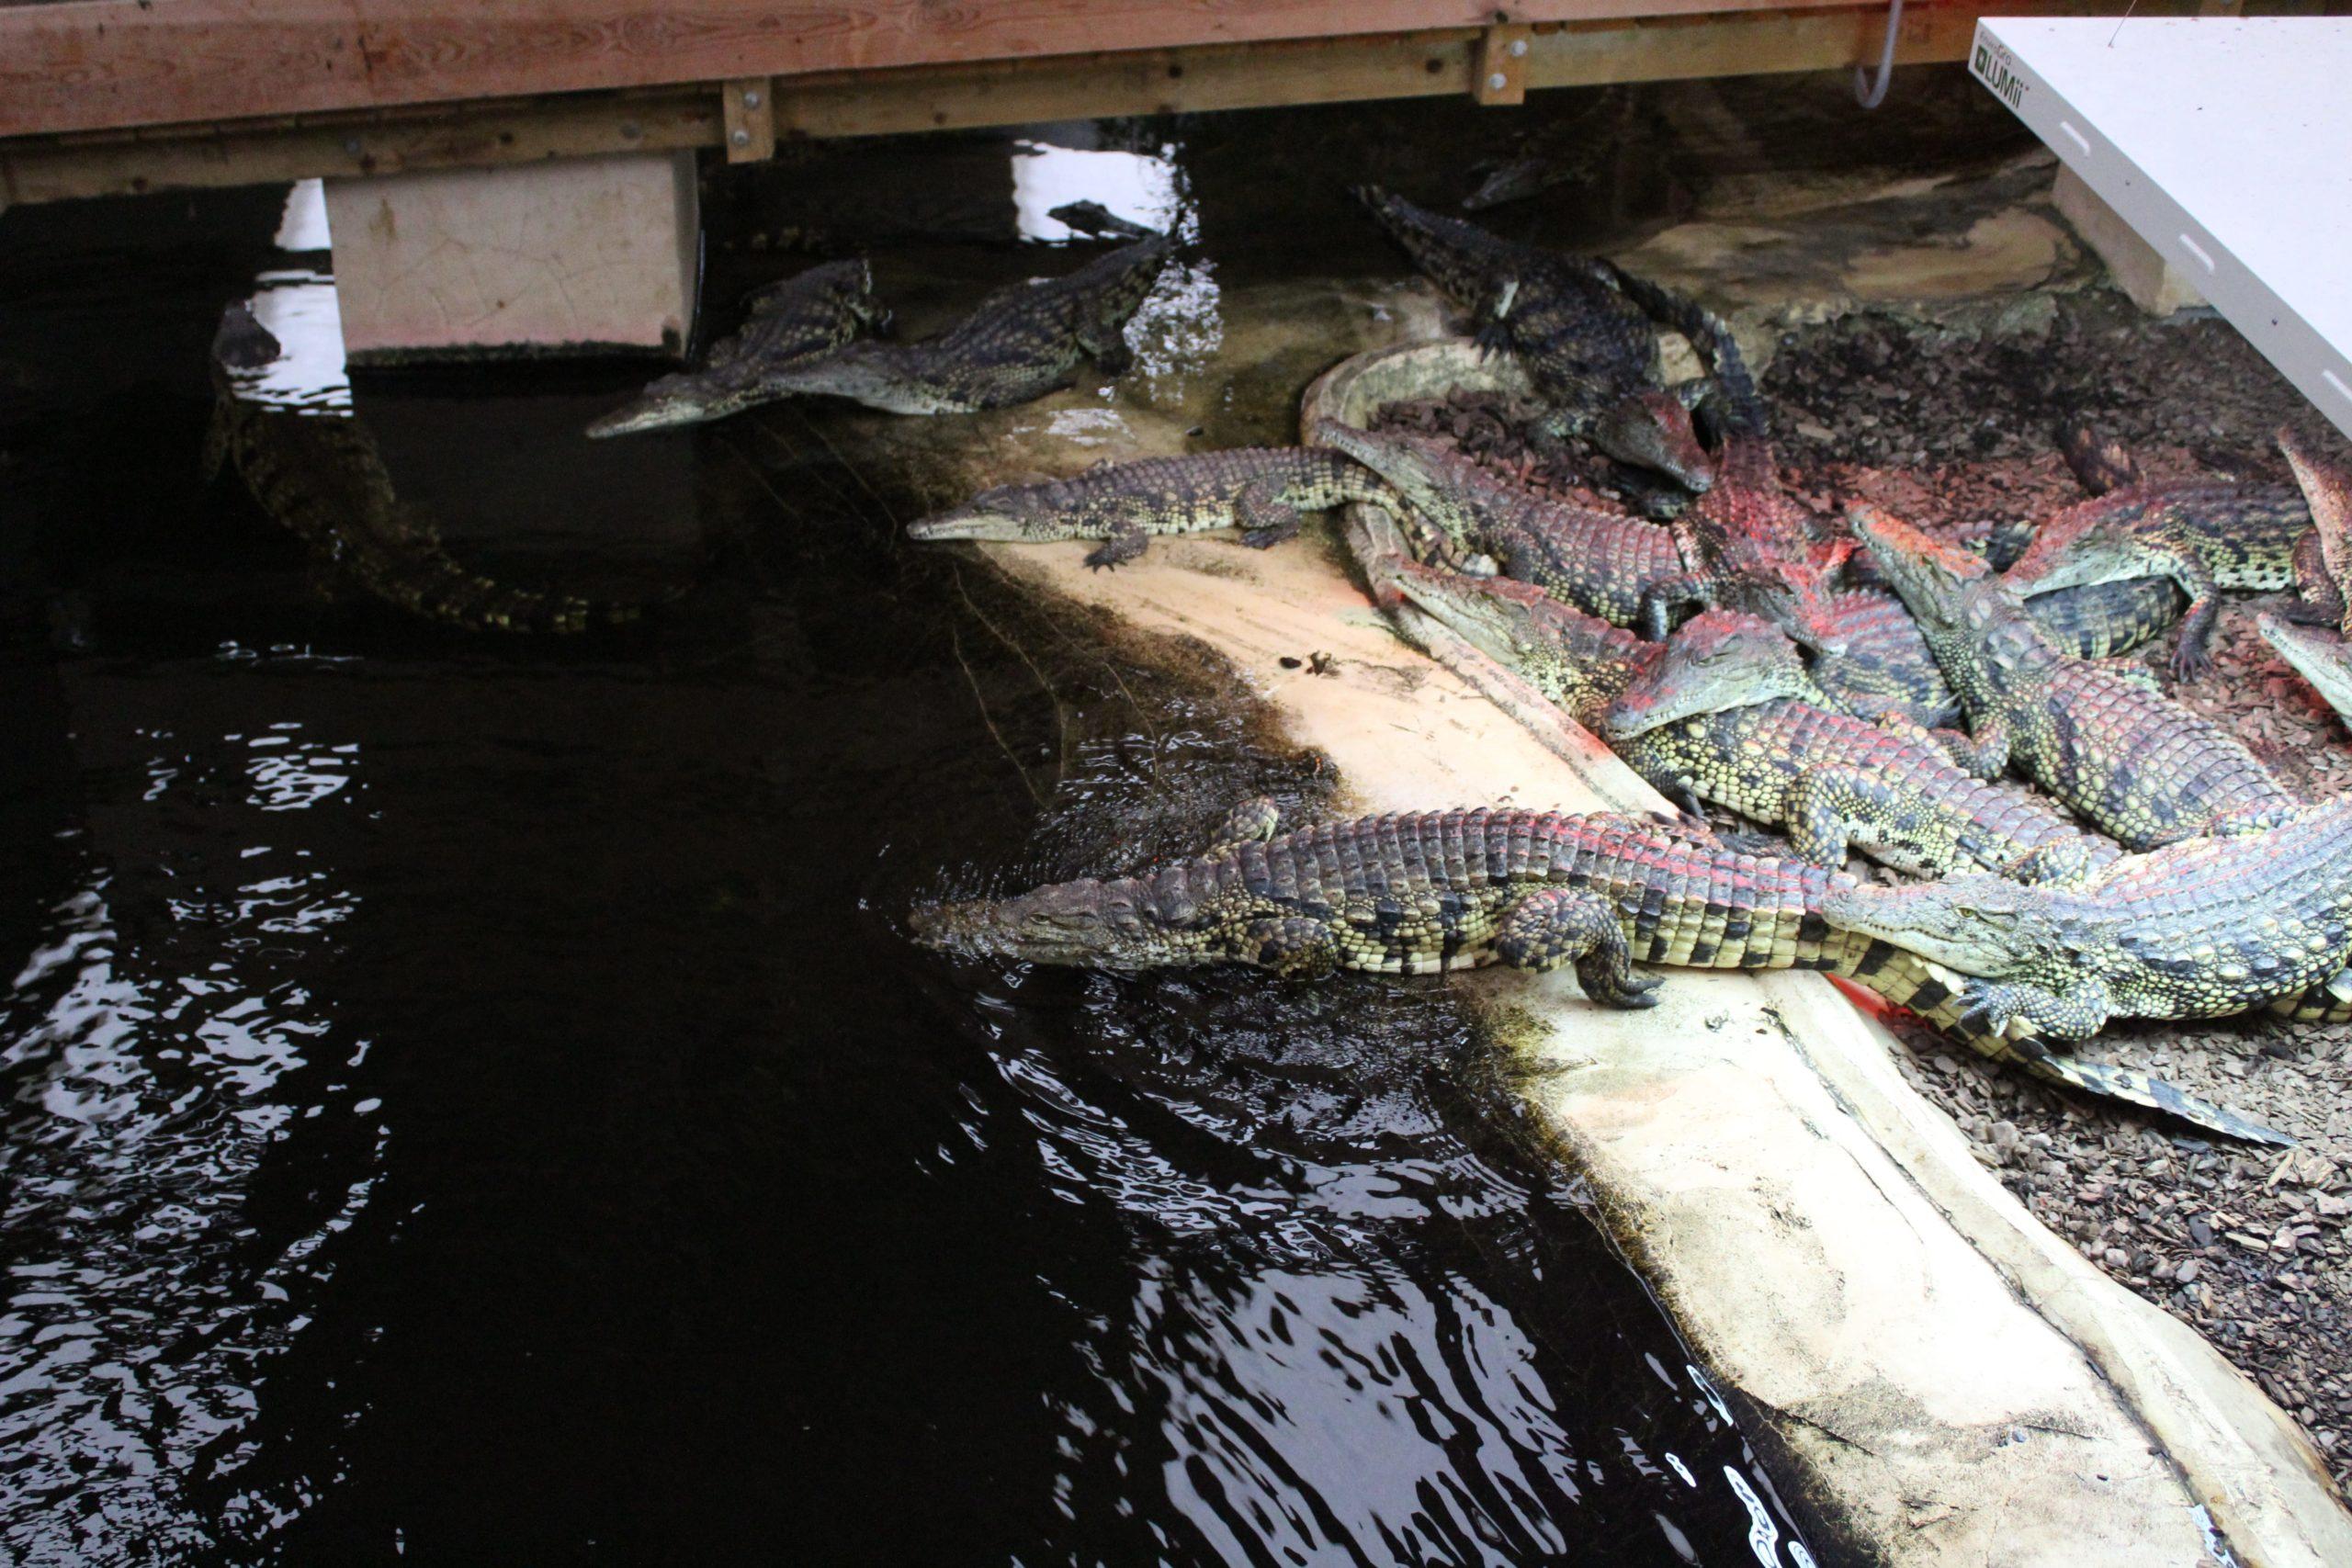 Nile Crocodile Feeding Experience